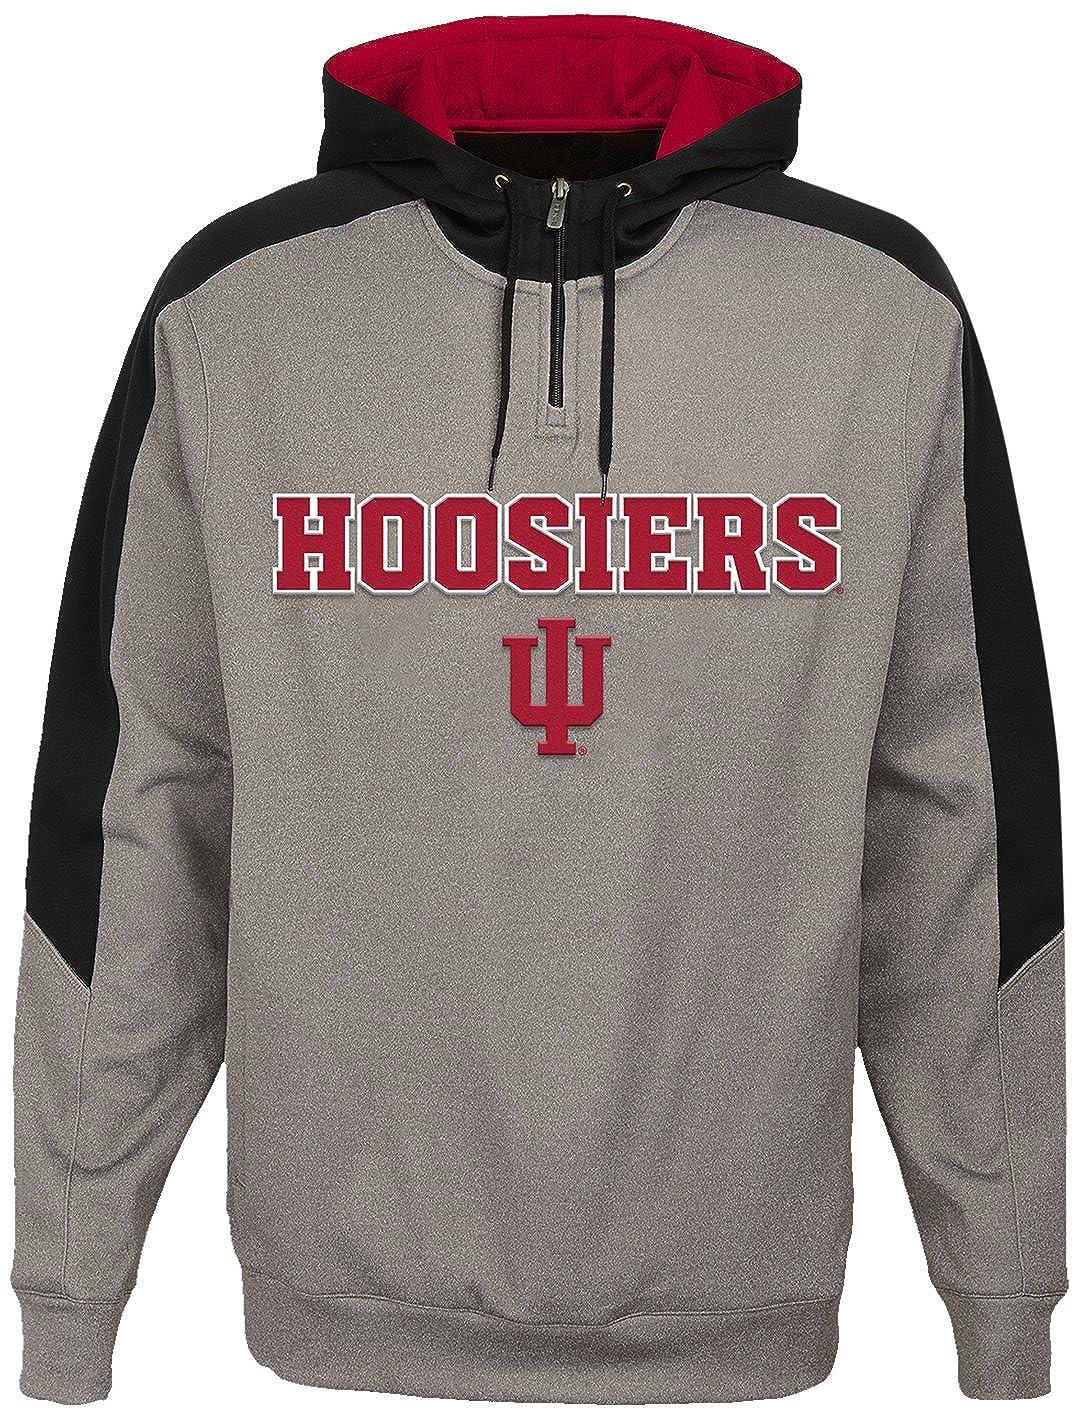 NCAA Indiana Hoosiers Mens Outerstuff Illustrious 1//4 Zip Hoodie Fleece X-Large Light Charcoal